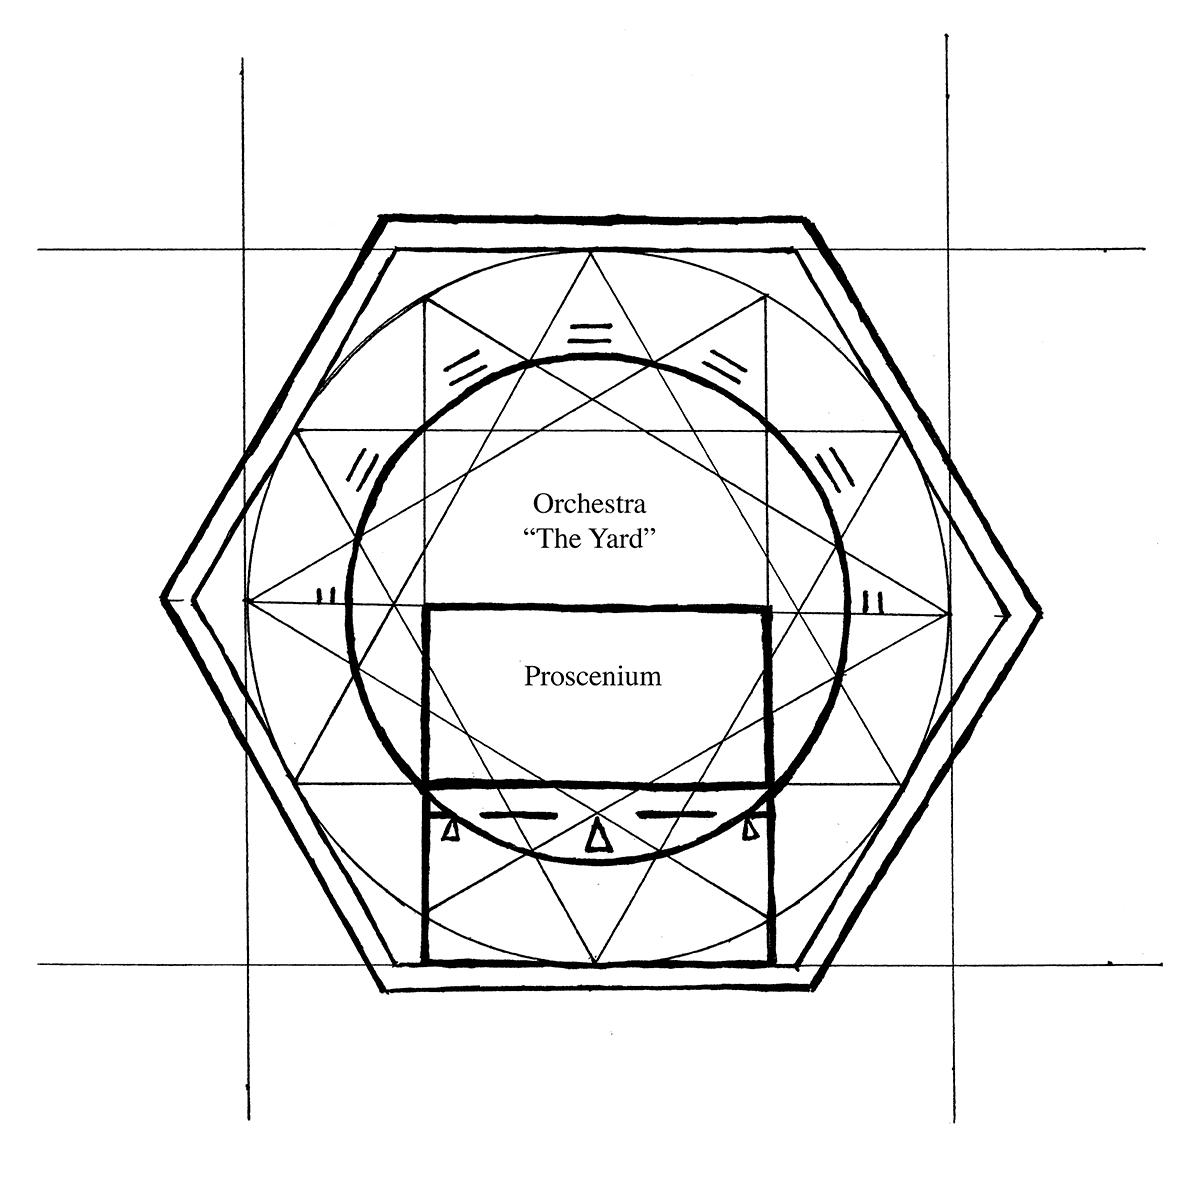 1200x1200 Illustration, Ground Plan Of Globe Theatre Exemplar Fragmentorum